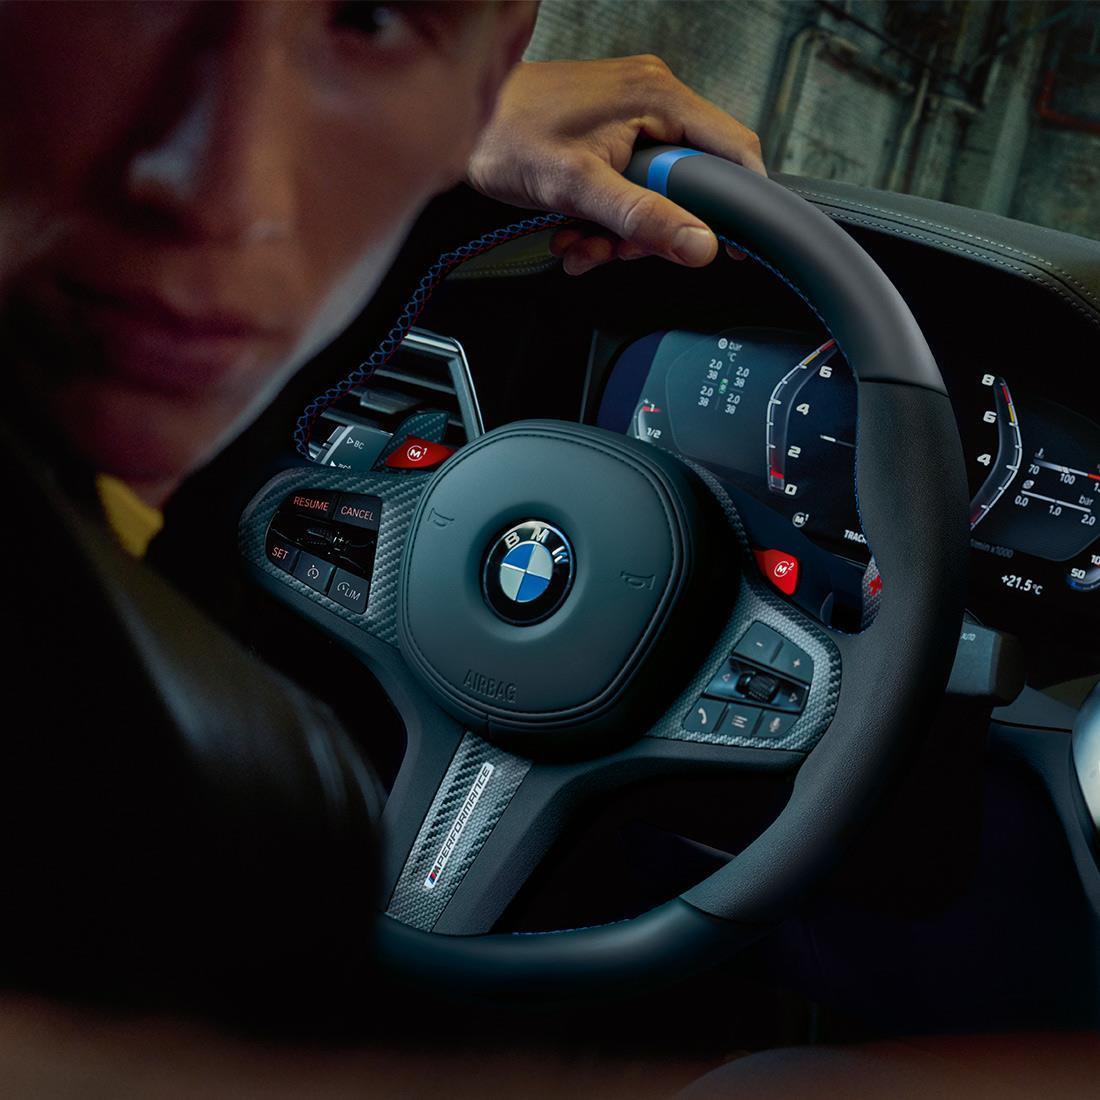 M Performance Steering wheel cover in carbon fiber/Alcantara